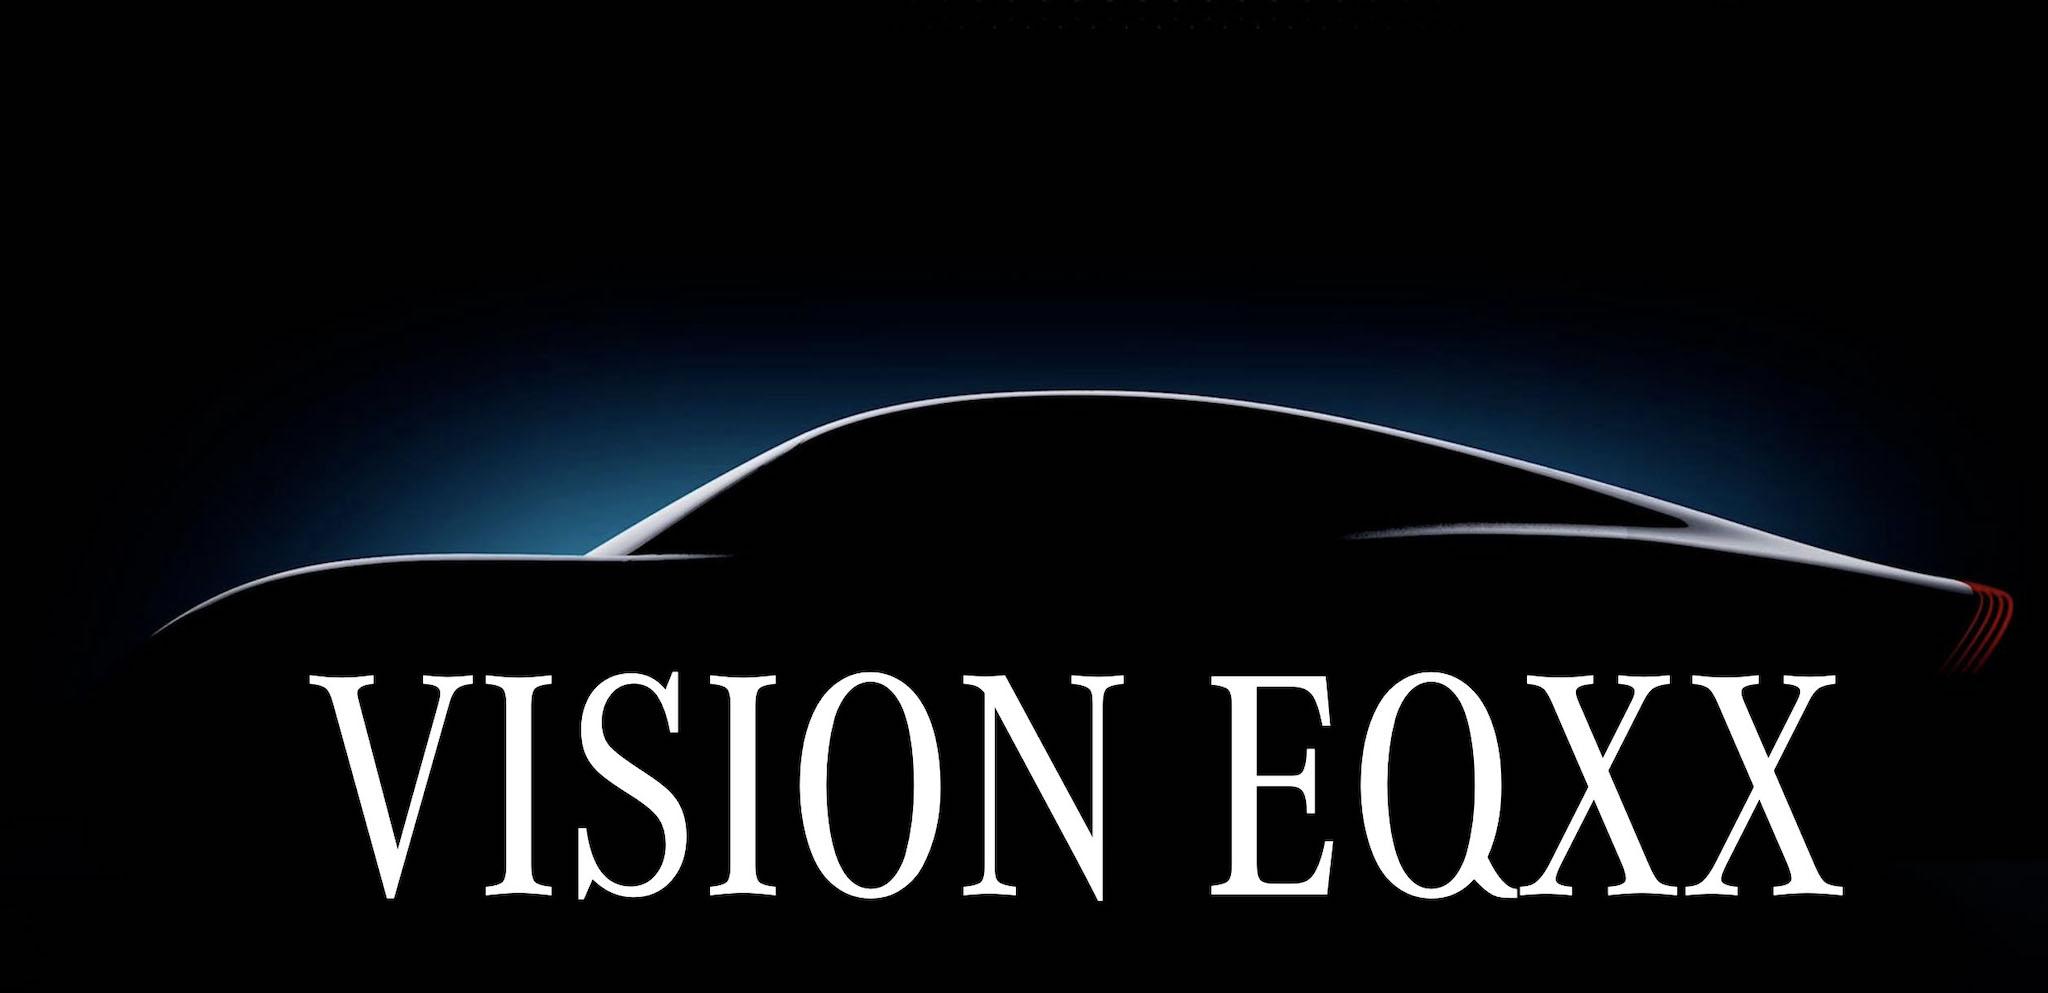 Mercedes-Benz Vision EQXX 計畫。